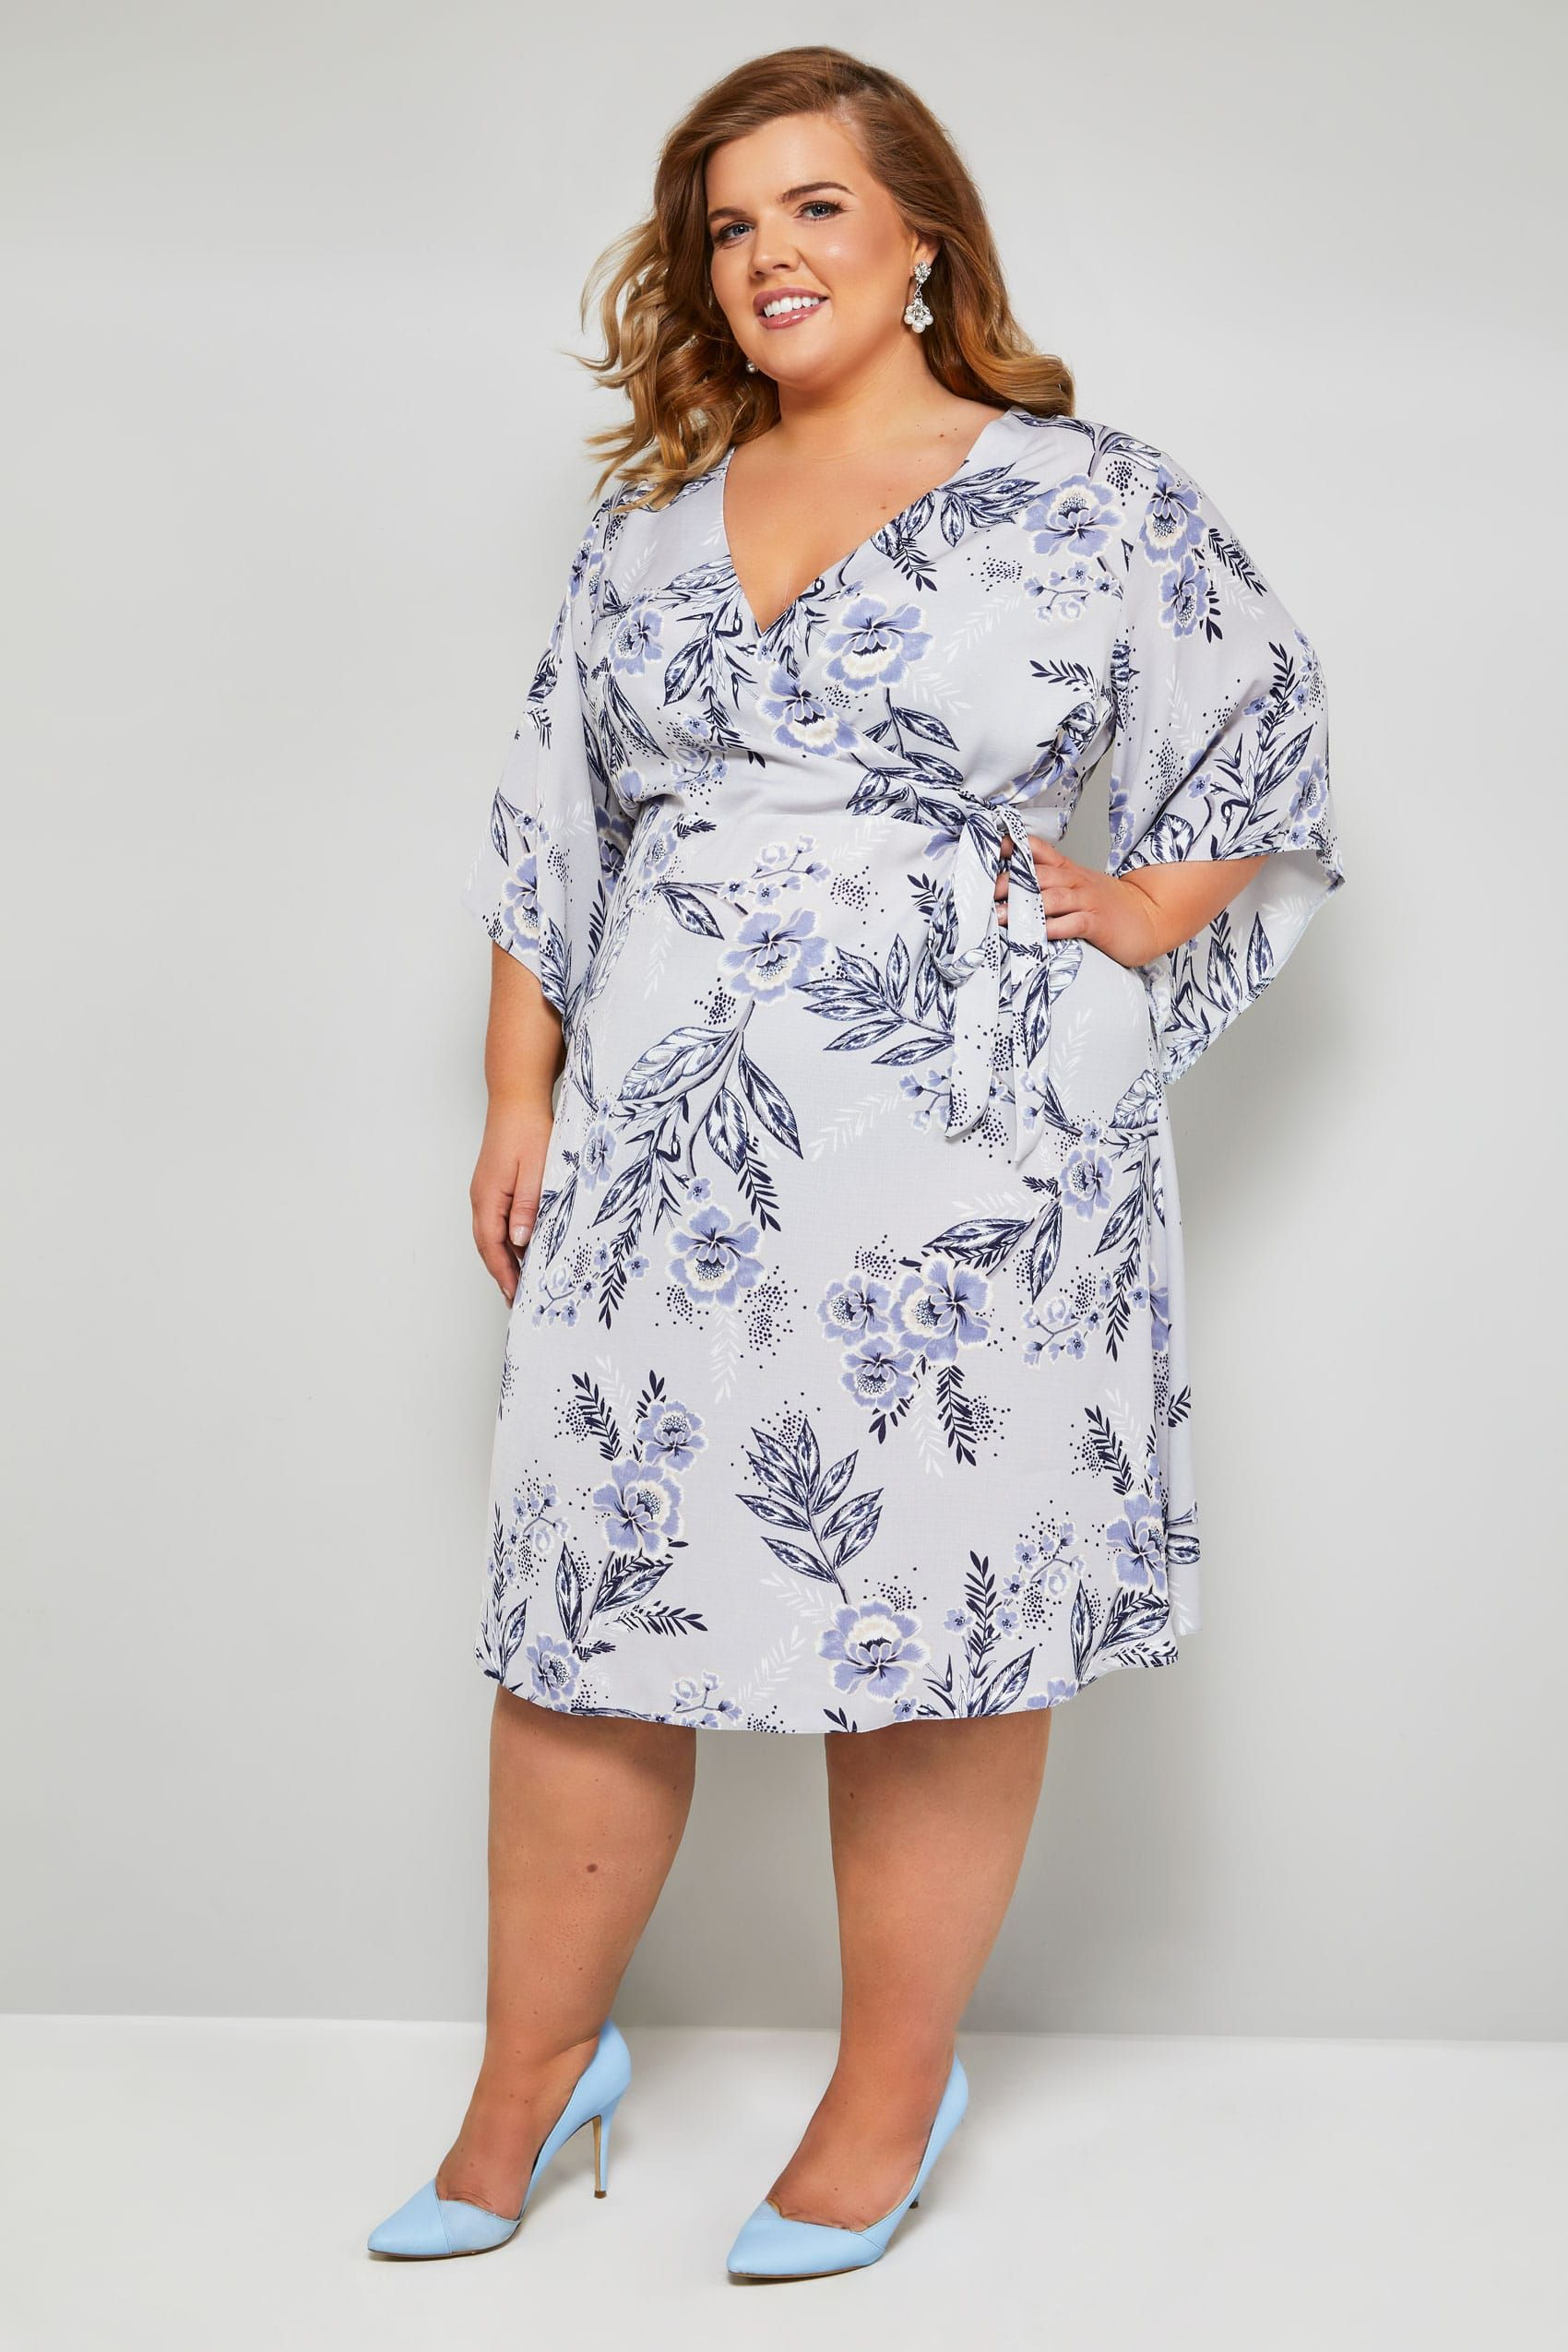 7cc28e8401cef YOURS LONDON Light Blue   Grey Floral Wrap Dress With Tie Waist